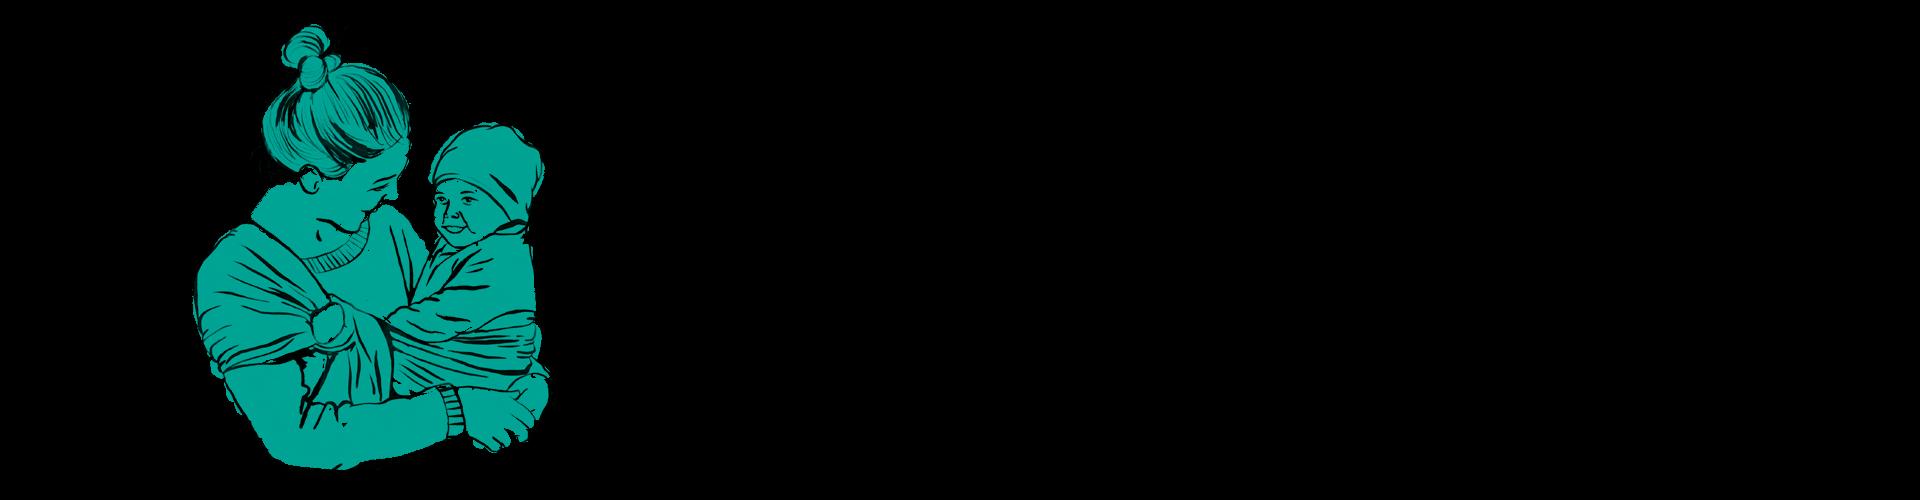 Kira-Daldrop_Stage-Trageberatung